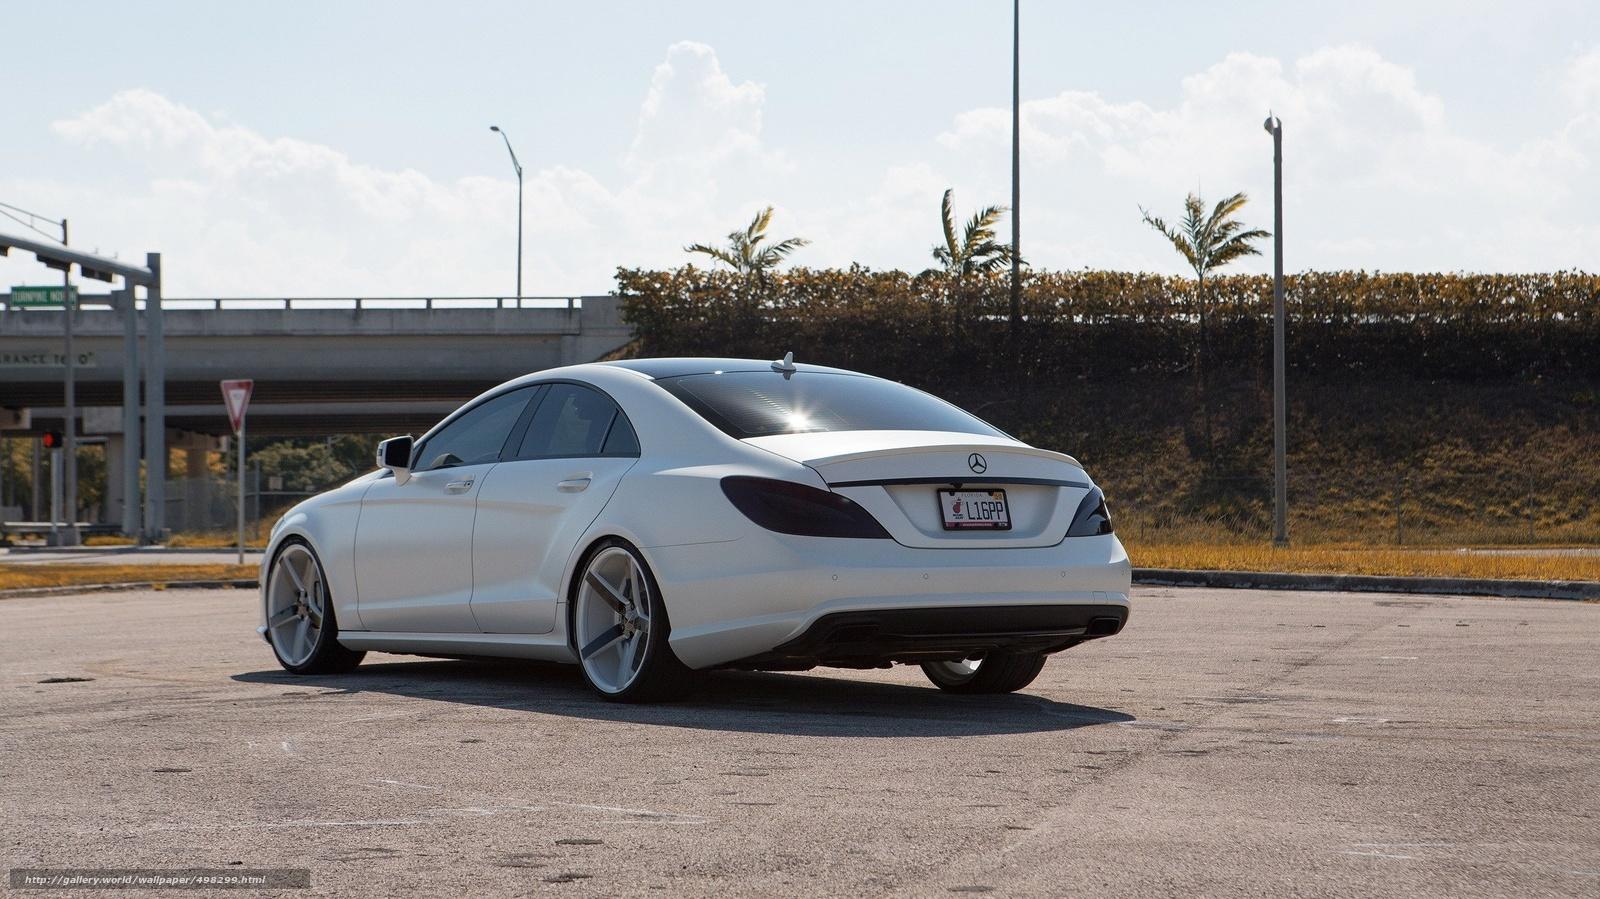 Descargar gratis Mercedes Benz,  Coche,  mquina,  coches Fondos de escritorio en la resolucin 2300x1293 — imagen №498299